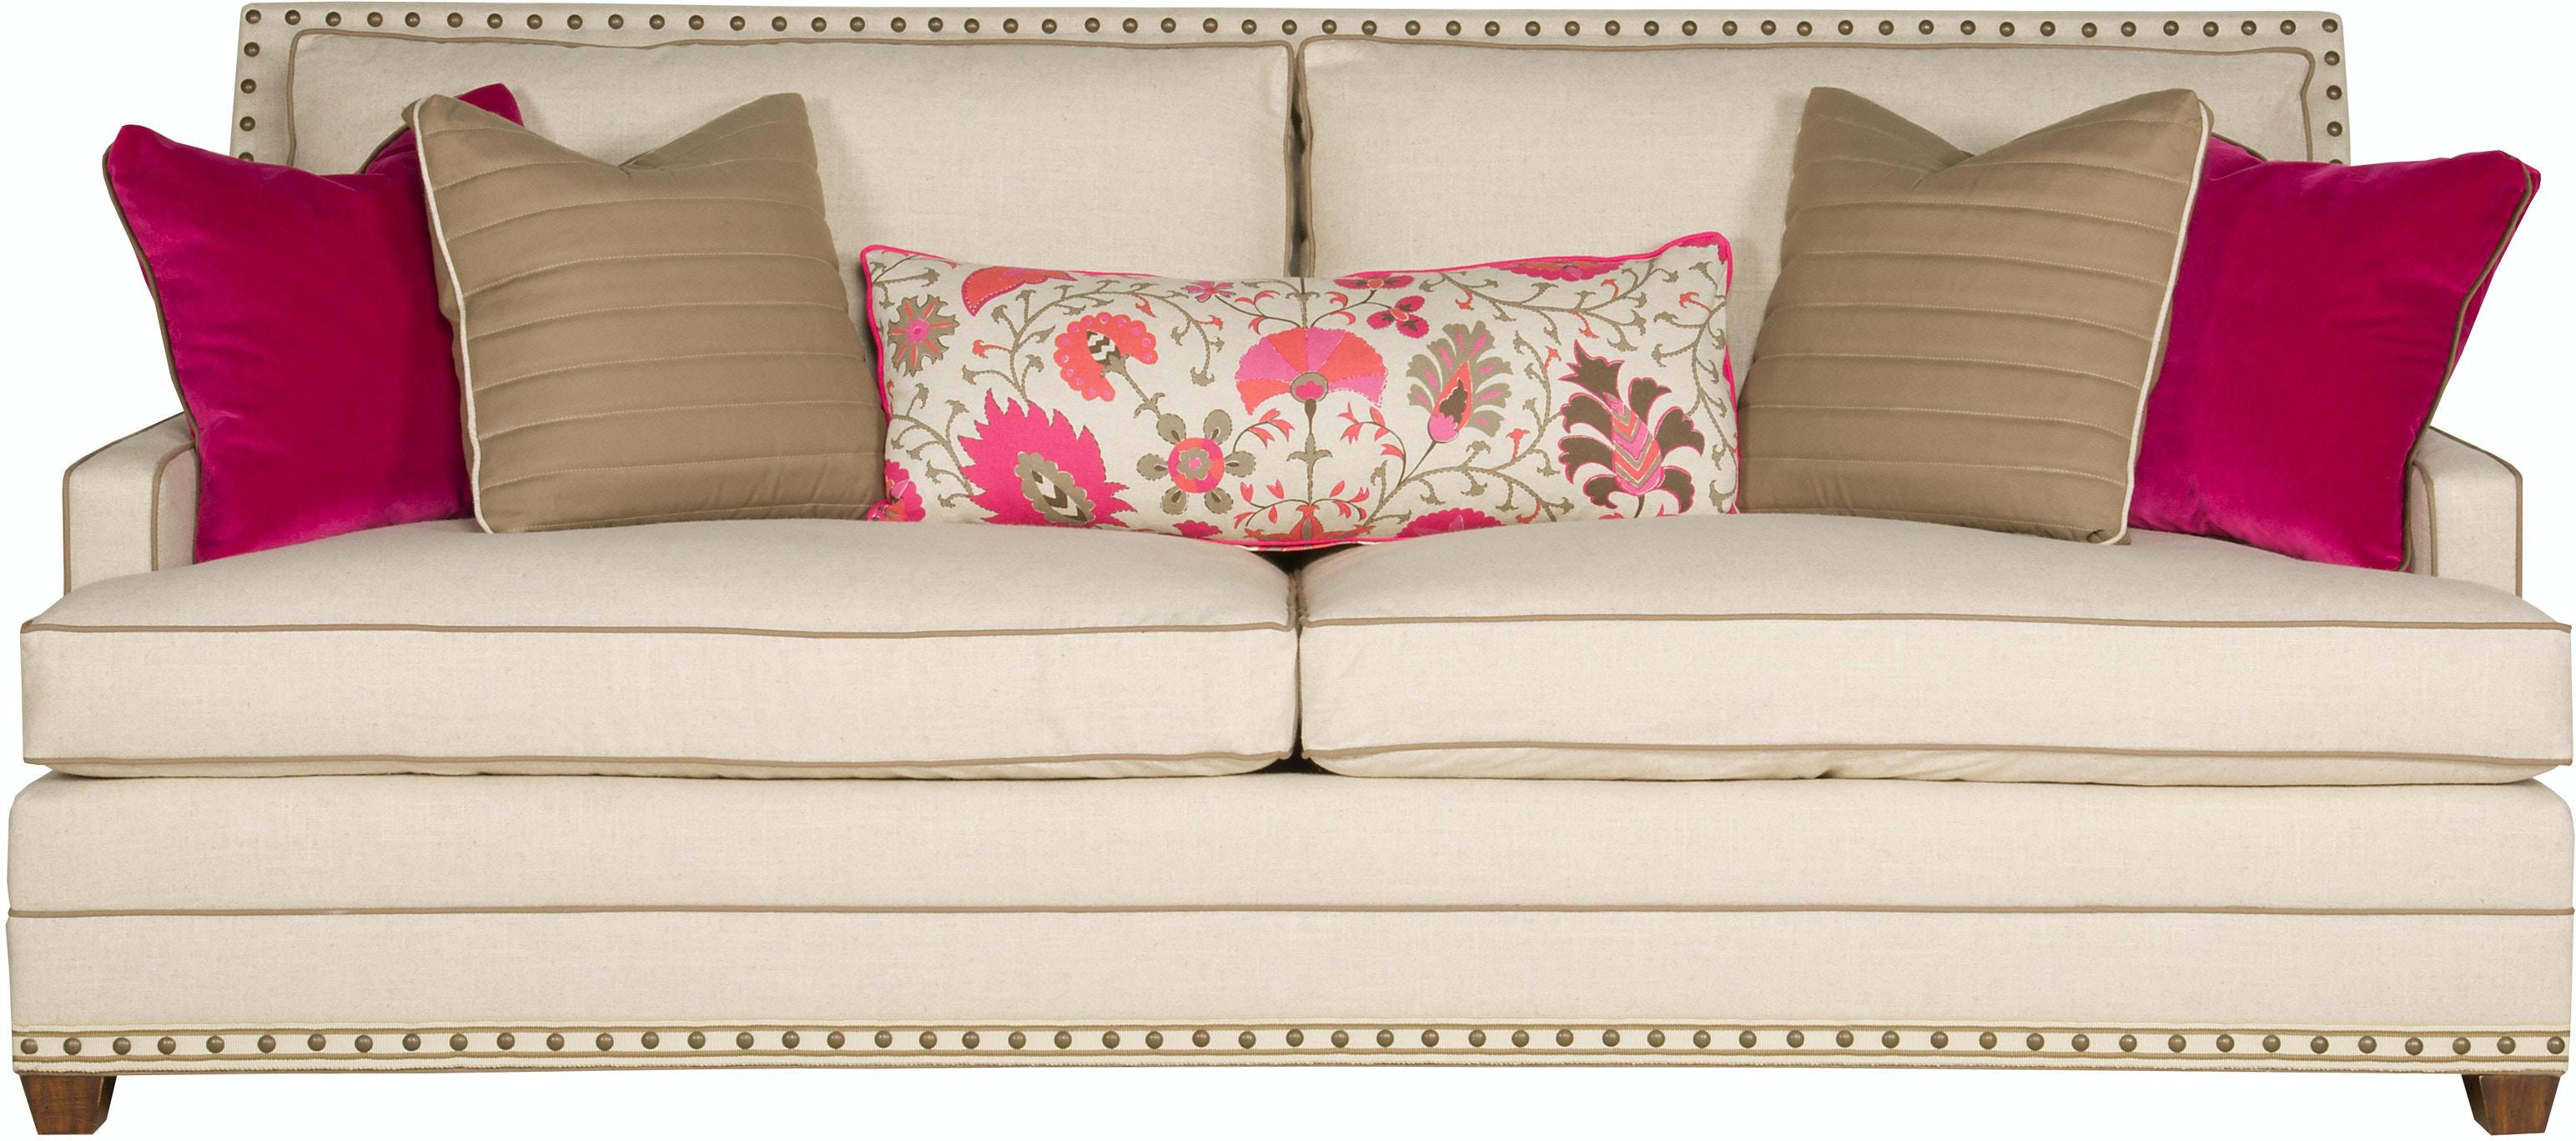 Vanguard Furniture 604 2S Living Room Riverside Sofa